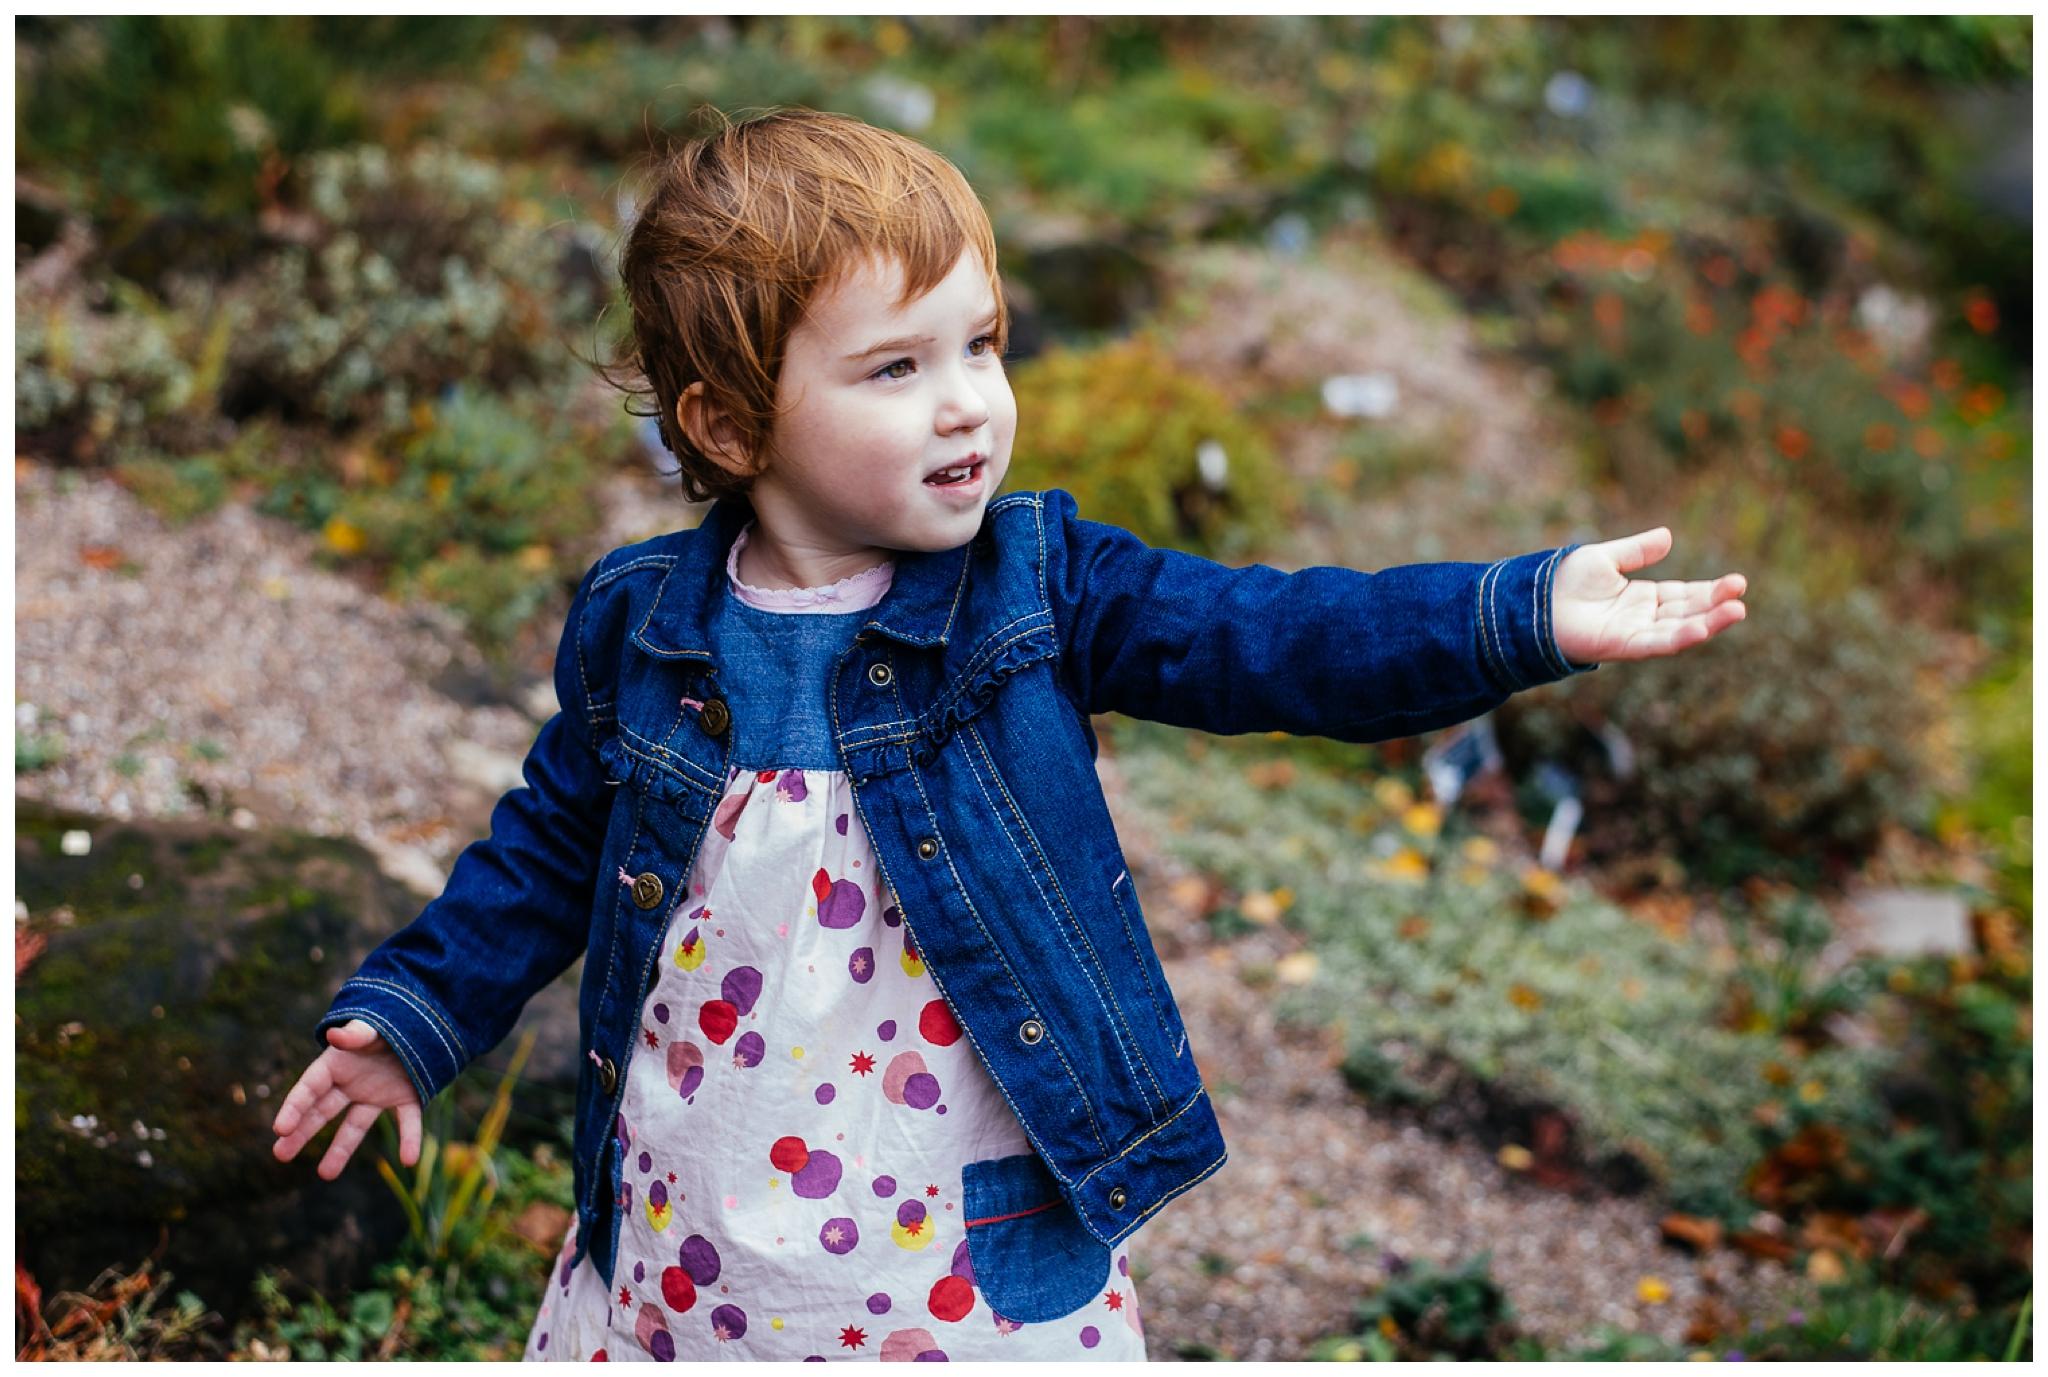 Autumn-family-portraits-birmingham-photographer_0037.jpg